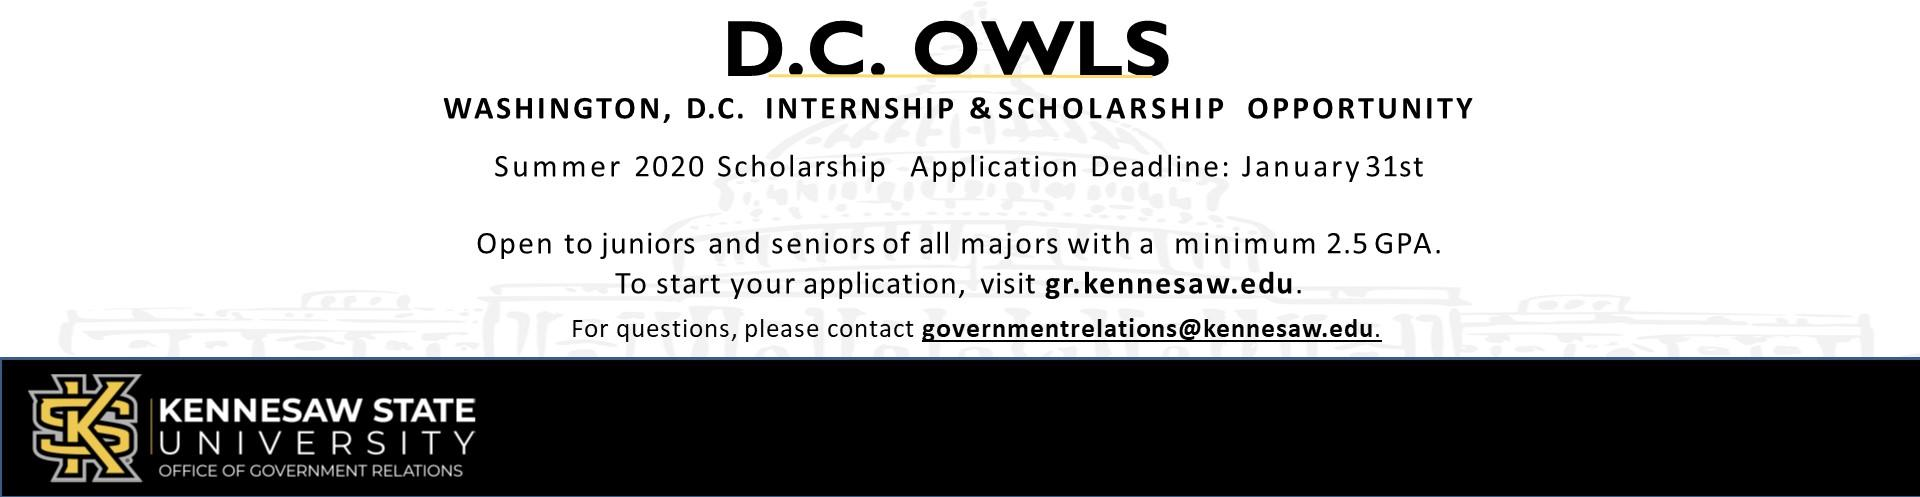 DC Owls Internship & Scholarship Opportunity